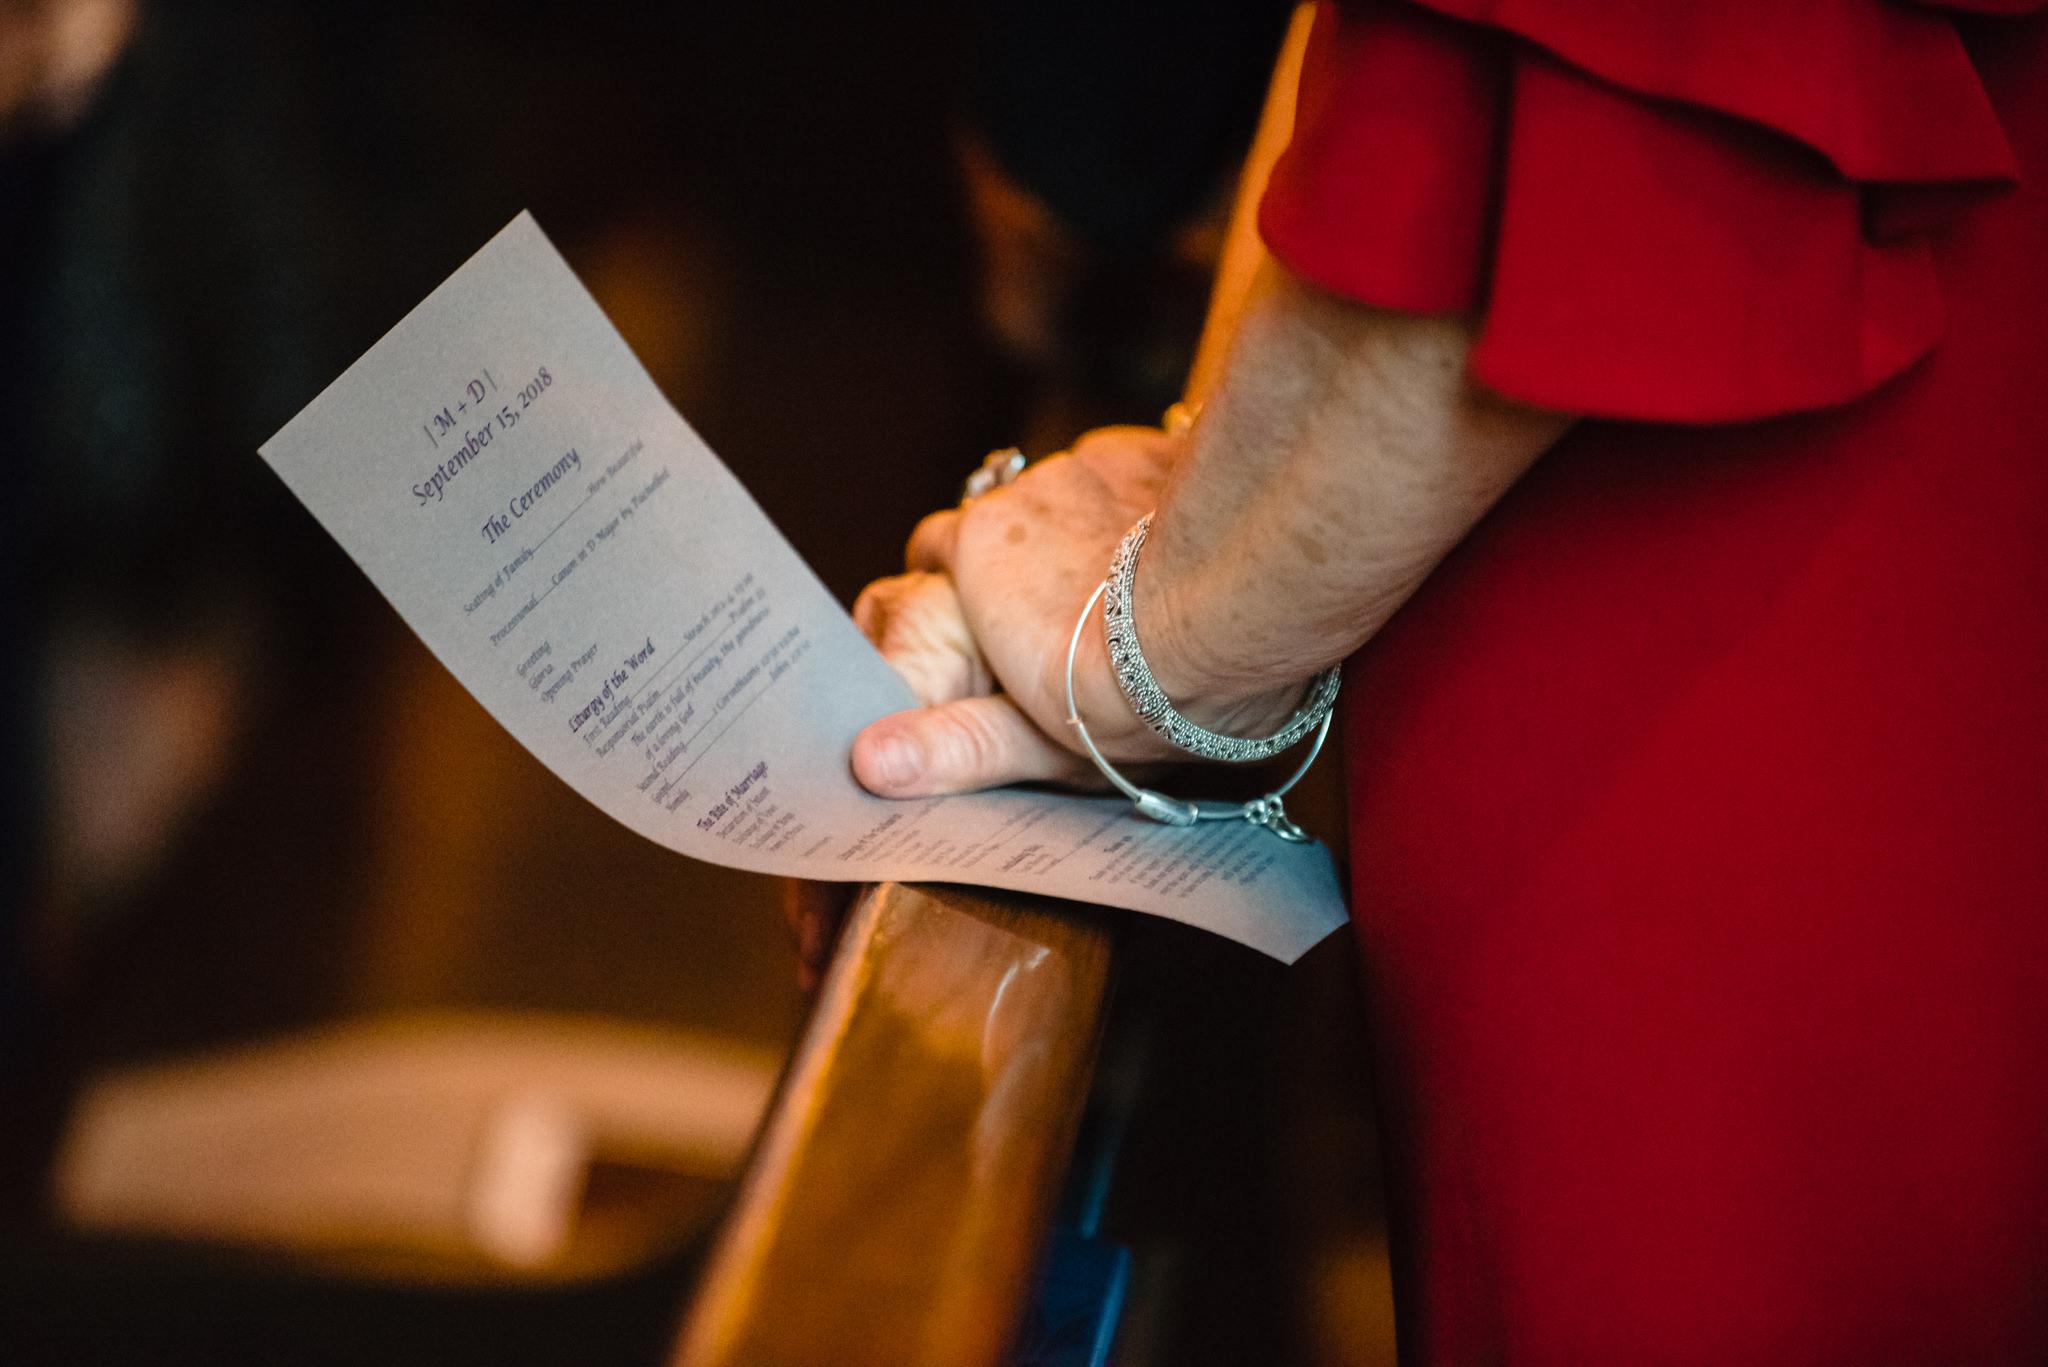 OMAHA-MARRIOTT-WEDDING-DOWNTOWN-MARRIOTT-OMAHA-WEDDING-PHOTOGRAPHER-JM-STUDIOS-014.jpg